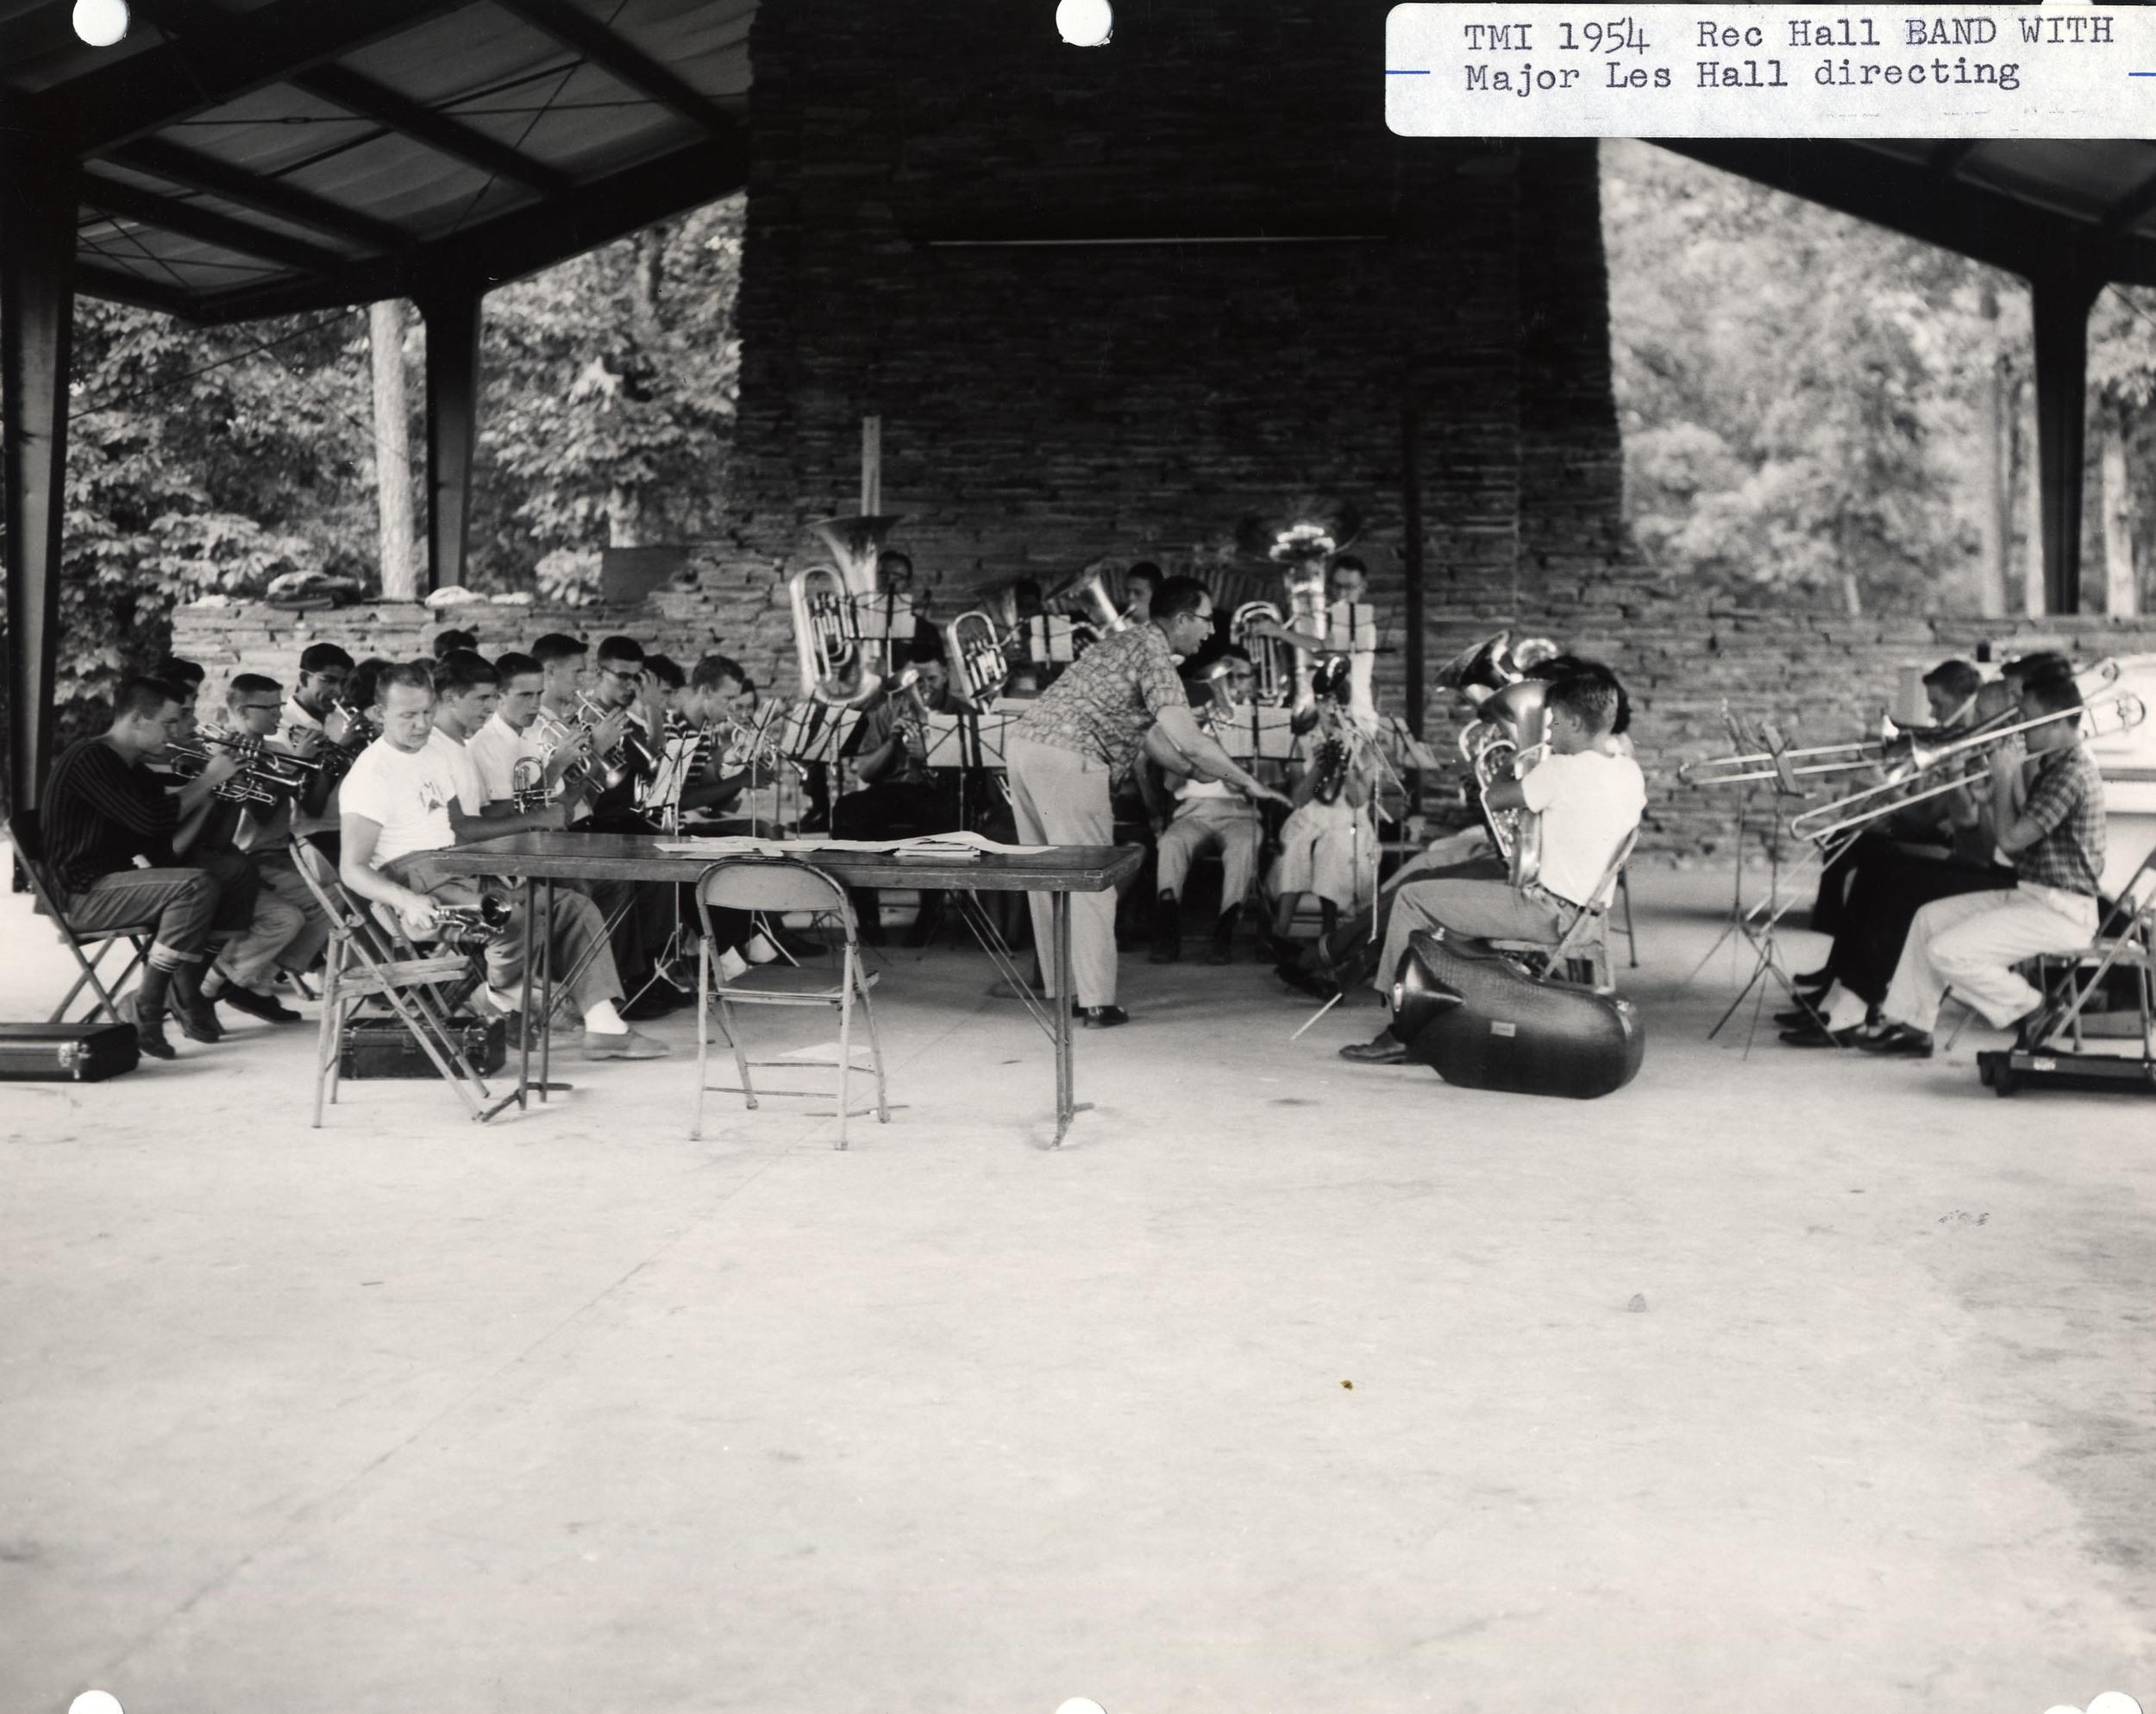 Territorial Music Institute (TMI) 1954, Rec Hall Band rehearsingwith Major Leslie Hall.Camp Grandview, Jasper, GA.